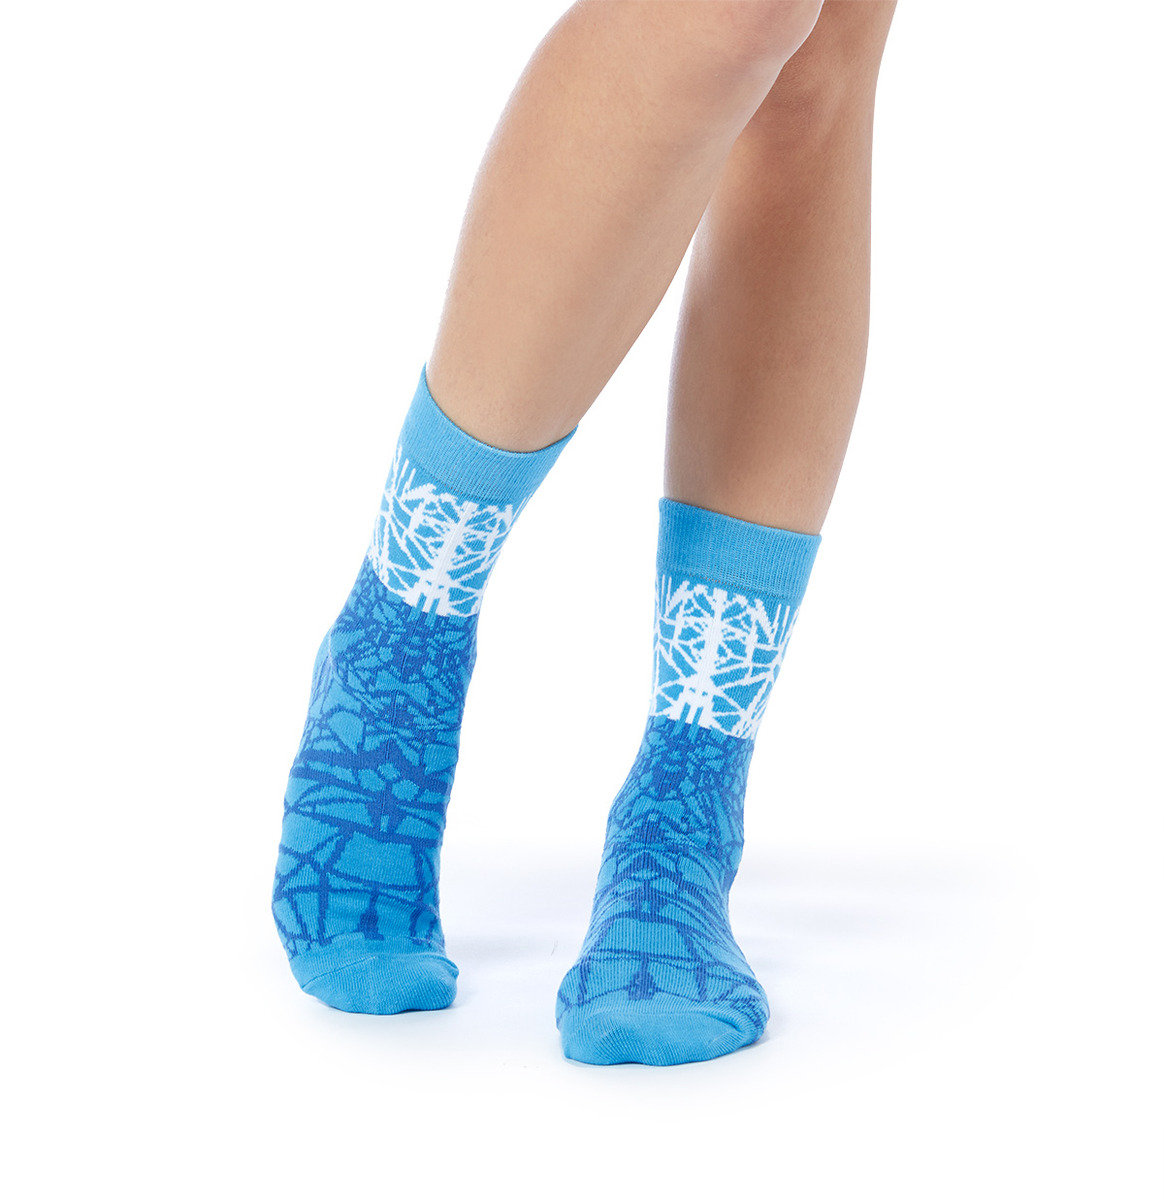 Honey x 112 mountainyam shattered glass crew socks